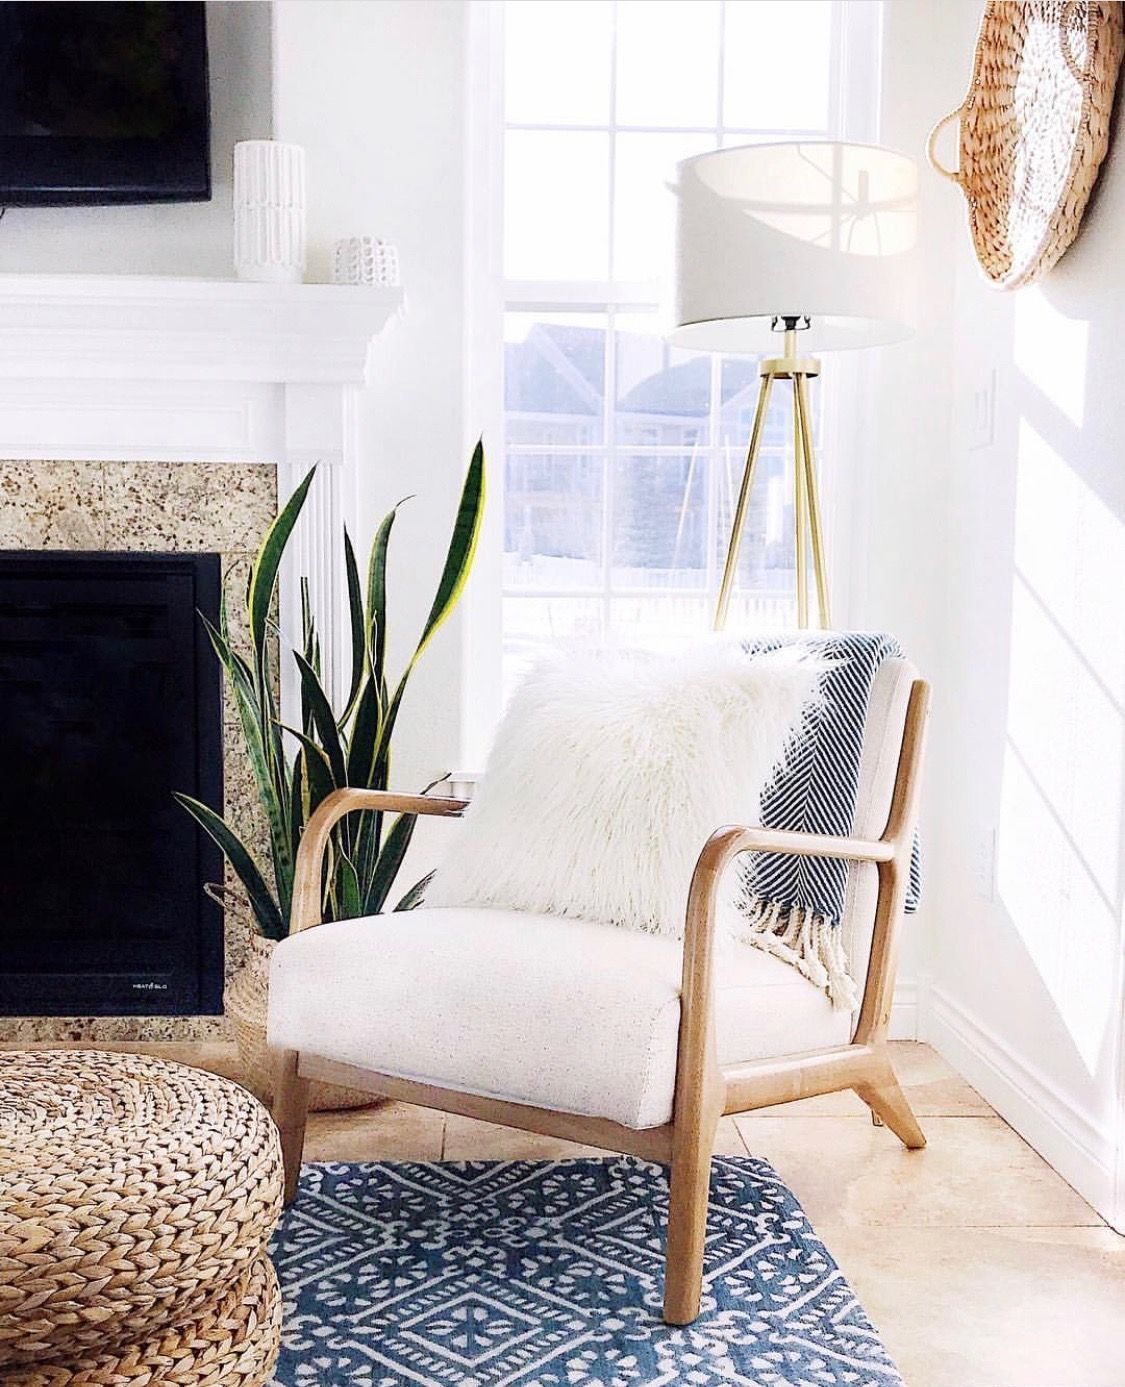 Pin by Bridget Downey on Boho Style in 2019 | Modern white ...